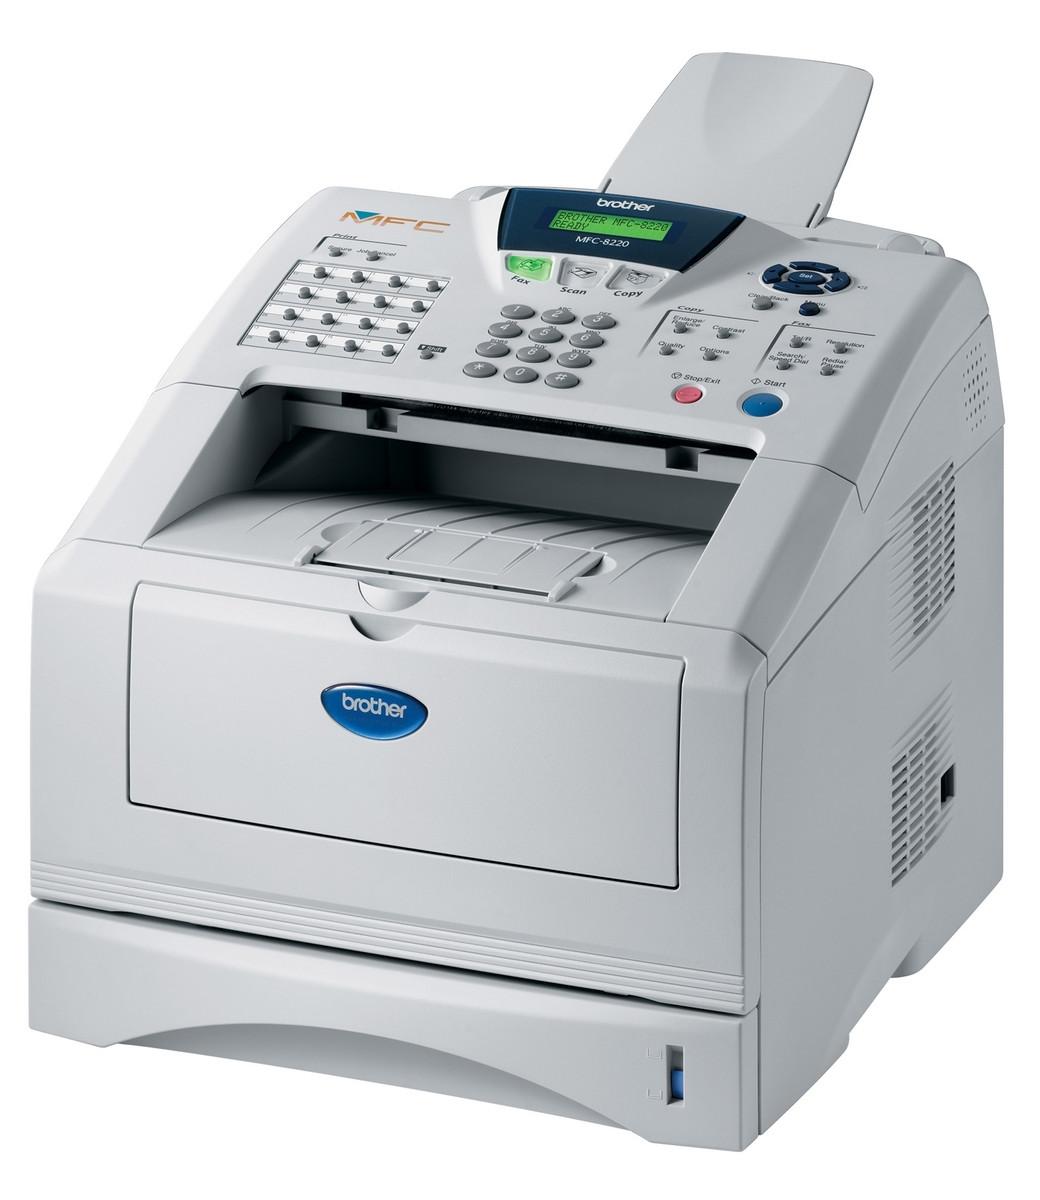 Brother MFC-8220 Printer